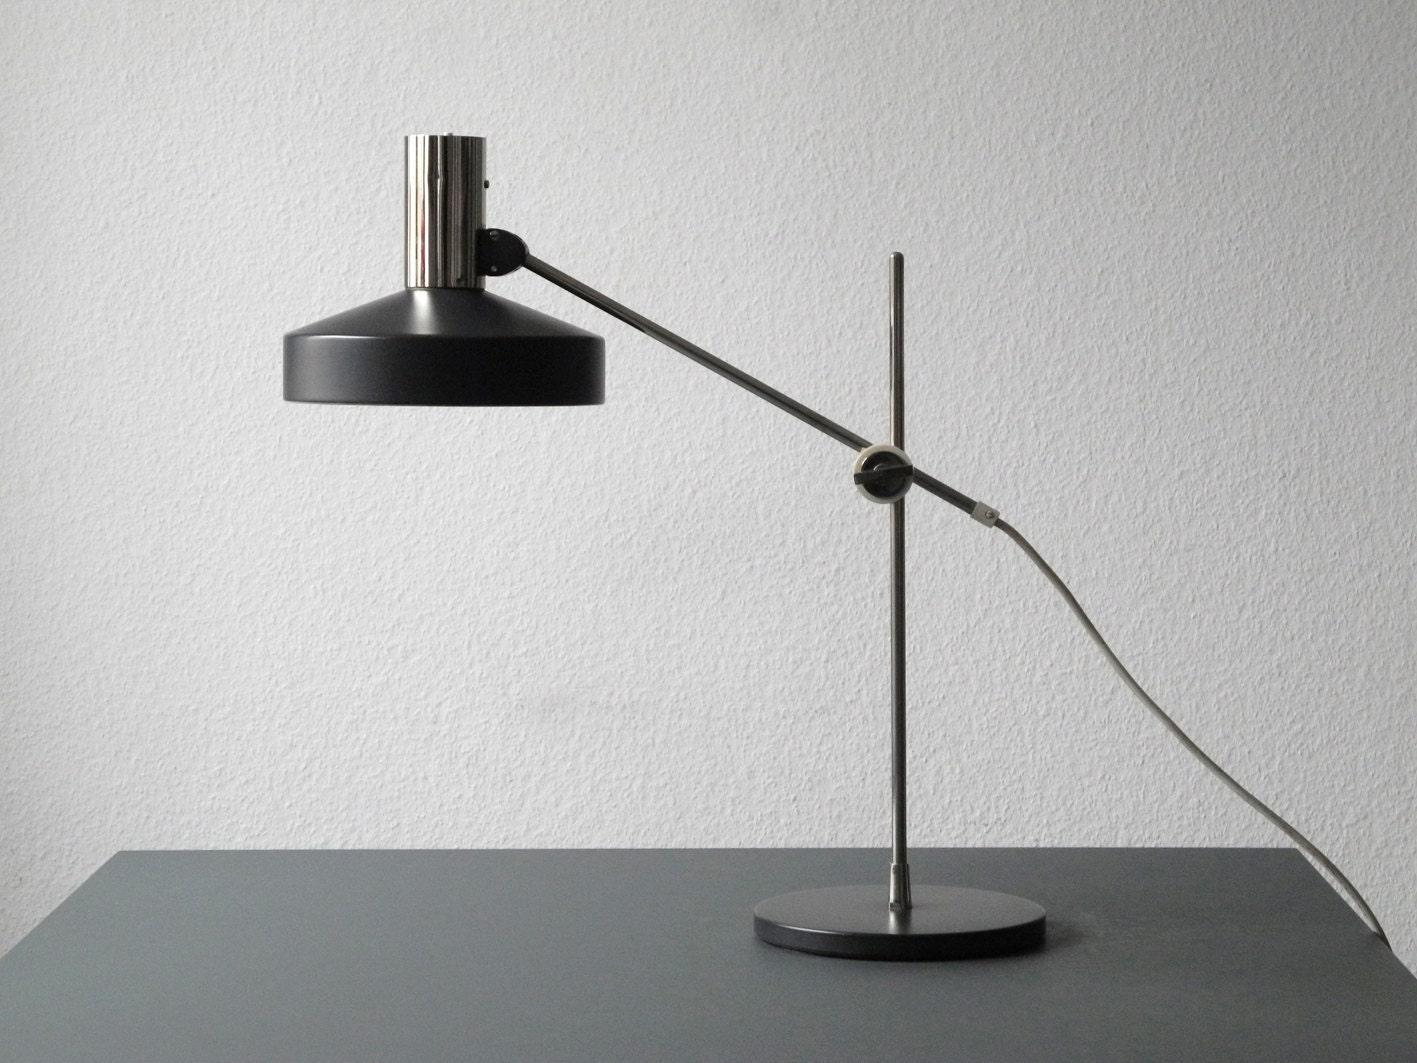 original rare 60s kaiser leuchten table desk night lamp light. Black Bedroom Furniture Sets. Home Design Ideas